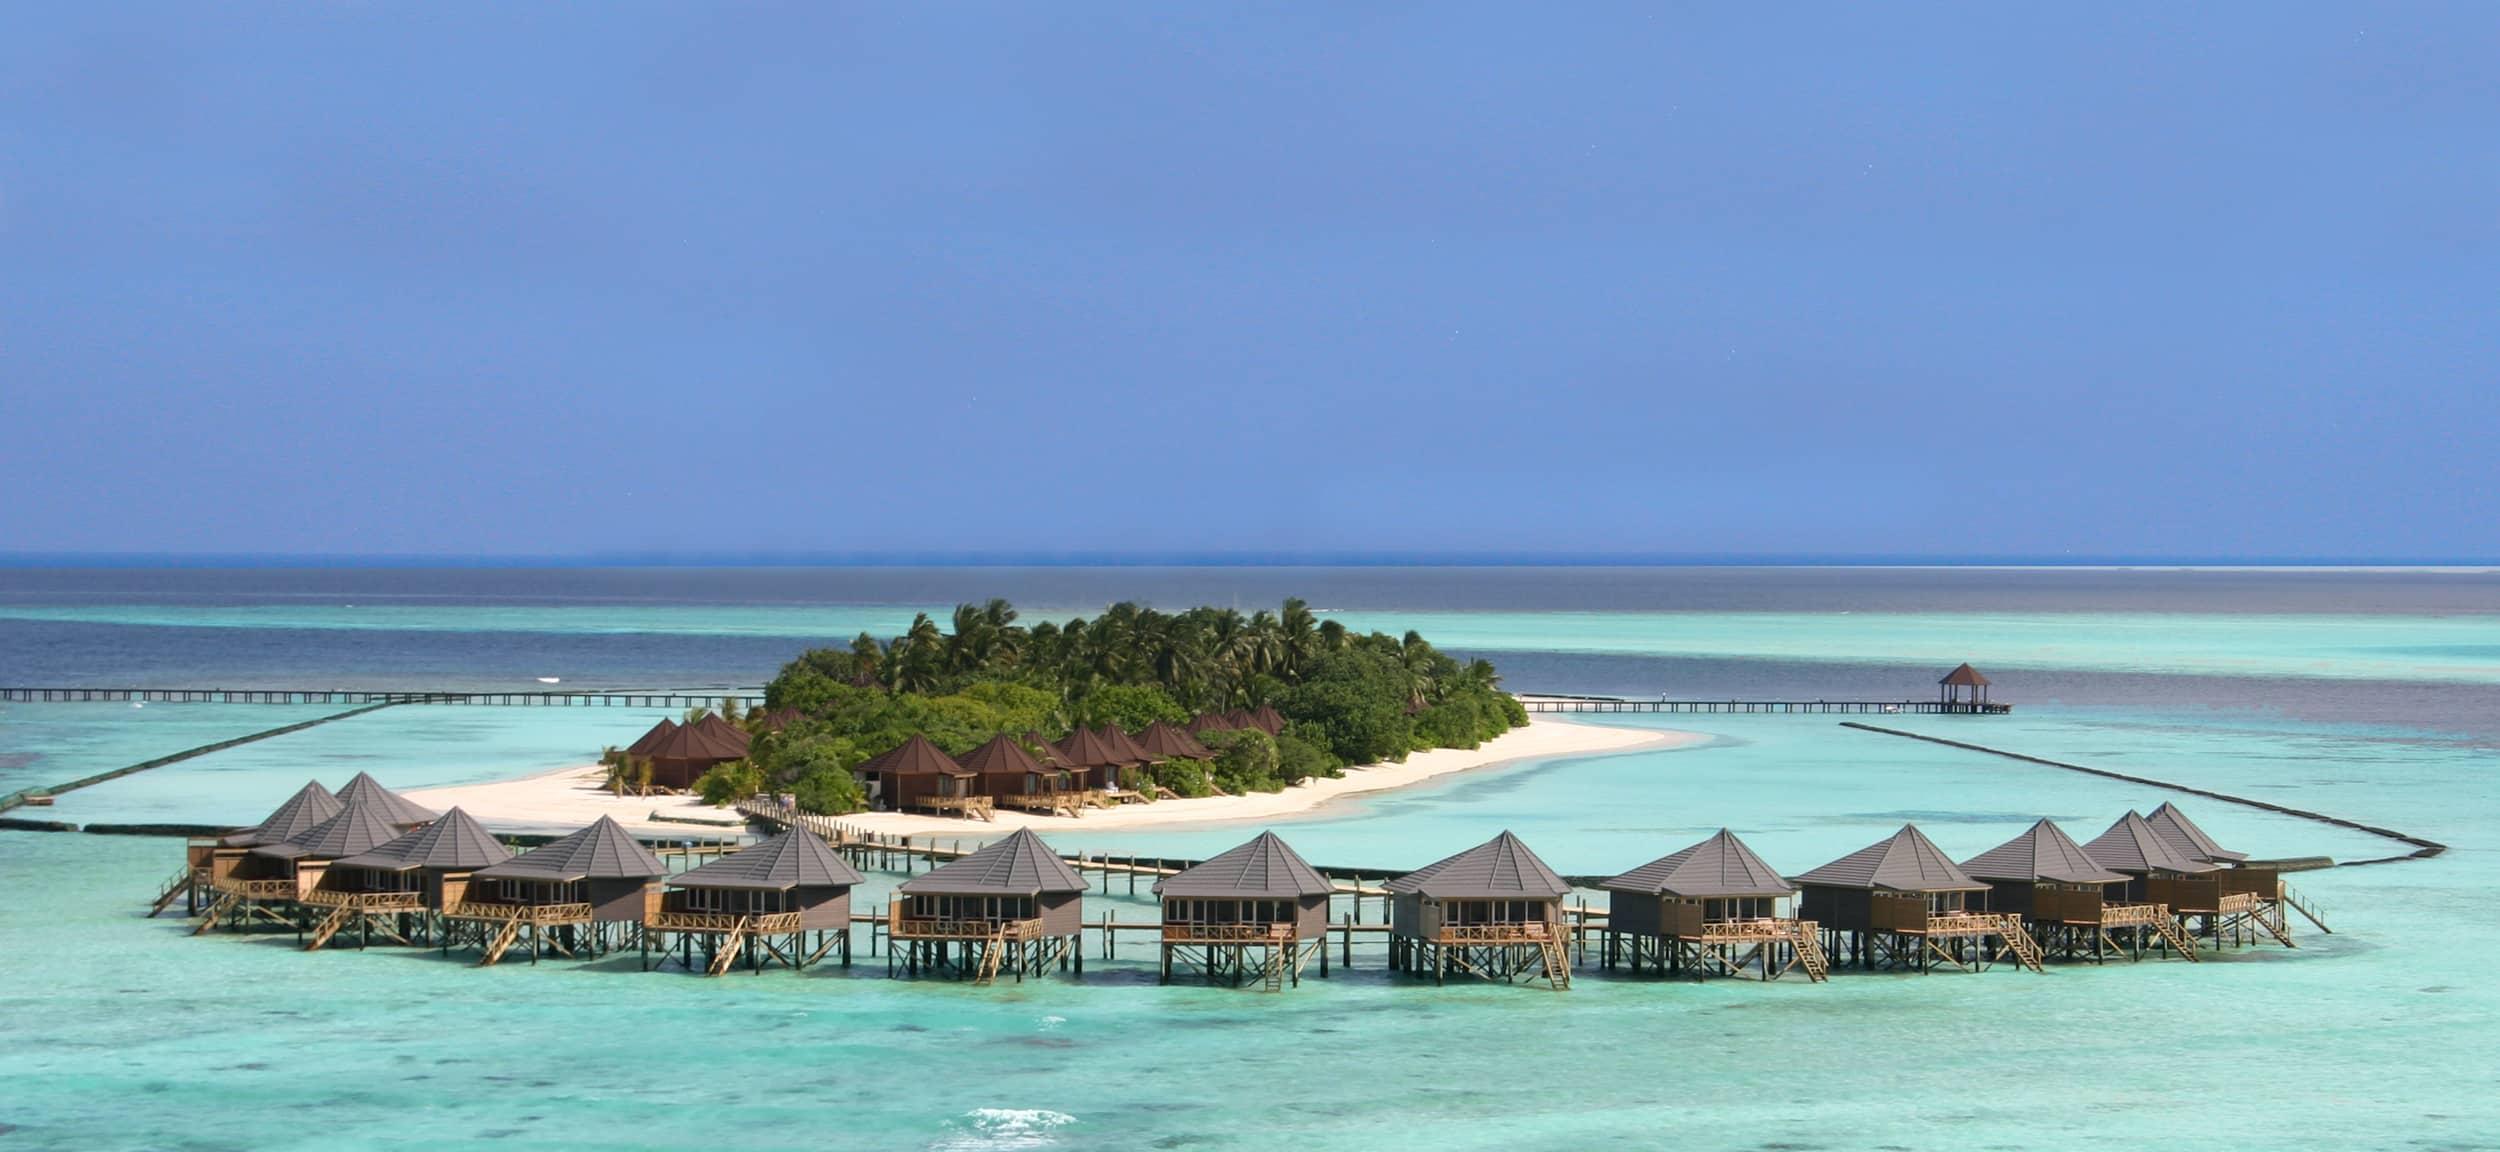 Komandoo to Kuredu Island Maldives All-Inclusive Tour (2021) 7